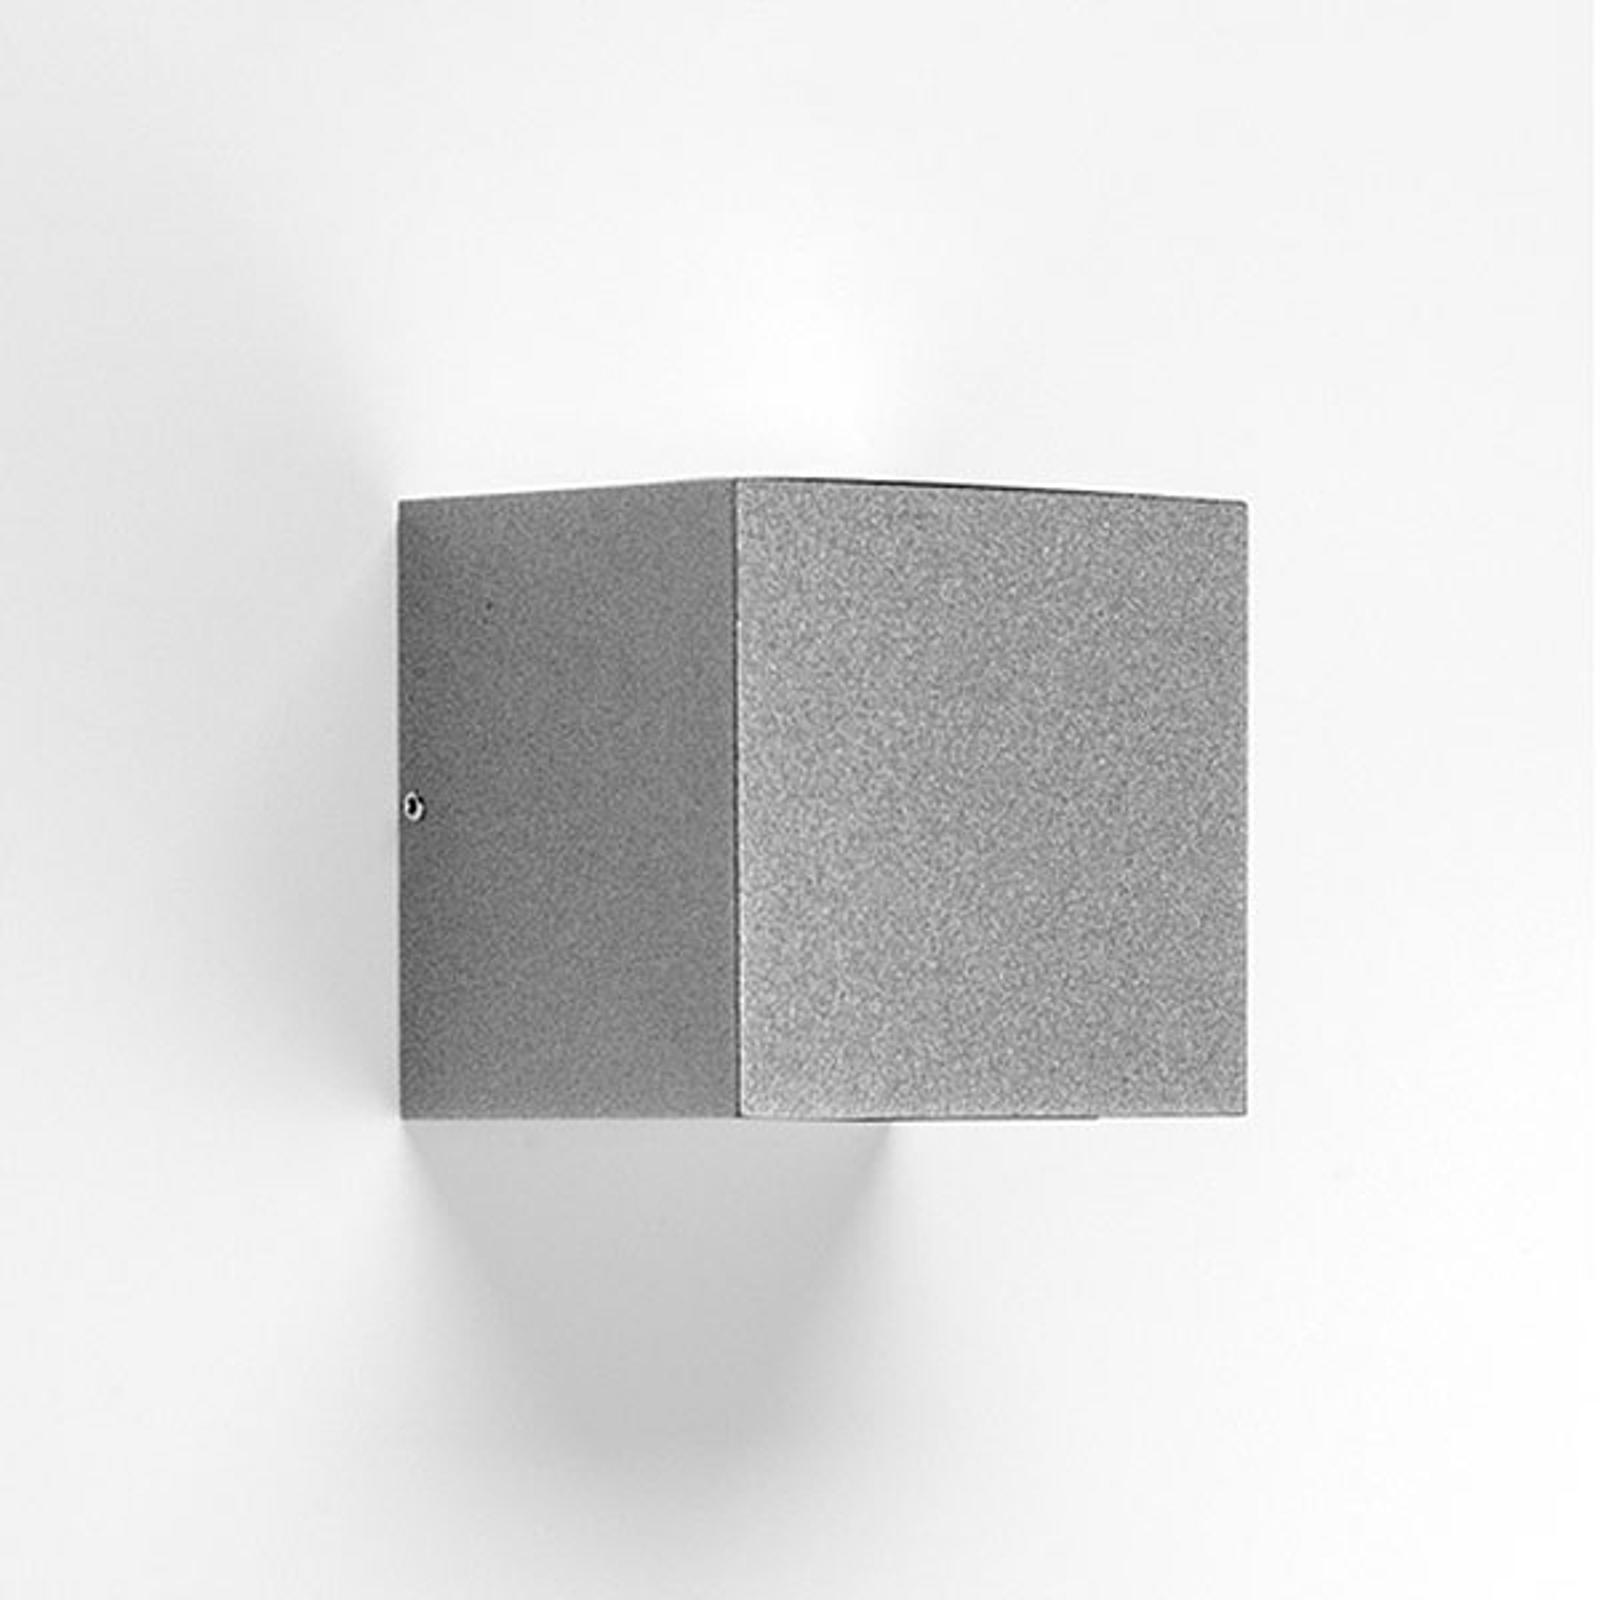 Harmaa LED-seinävalaisin 303354, 1WB, 3 000 K